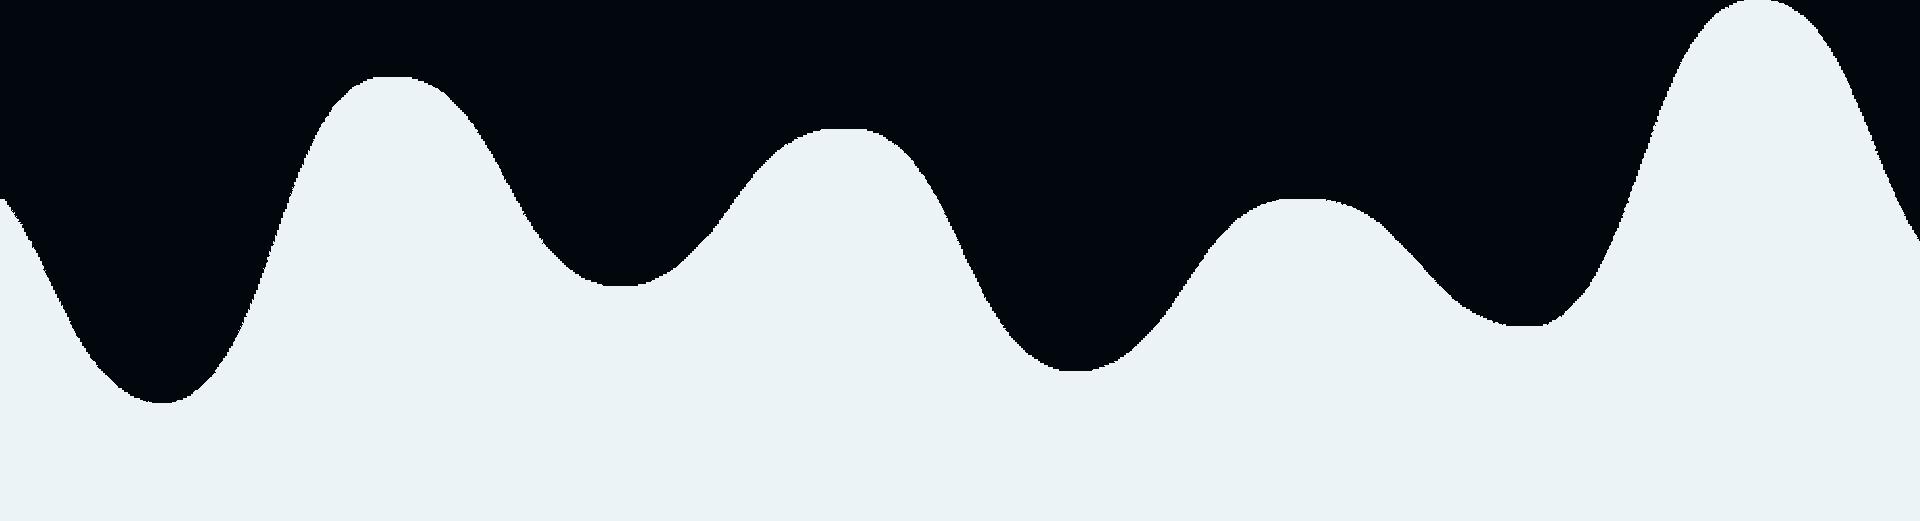 contact shape